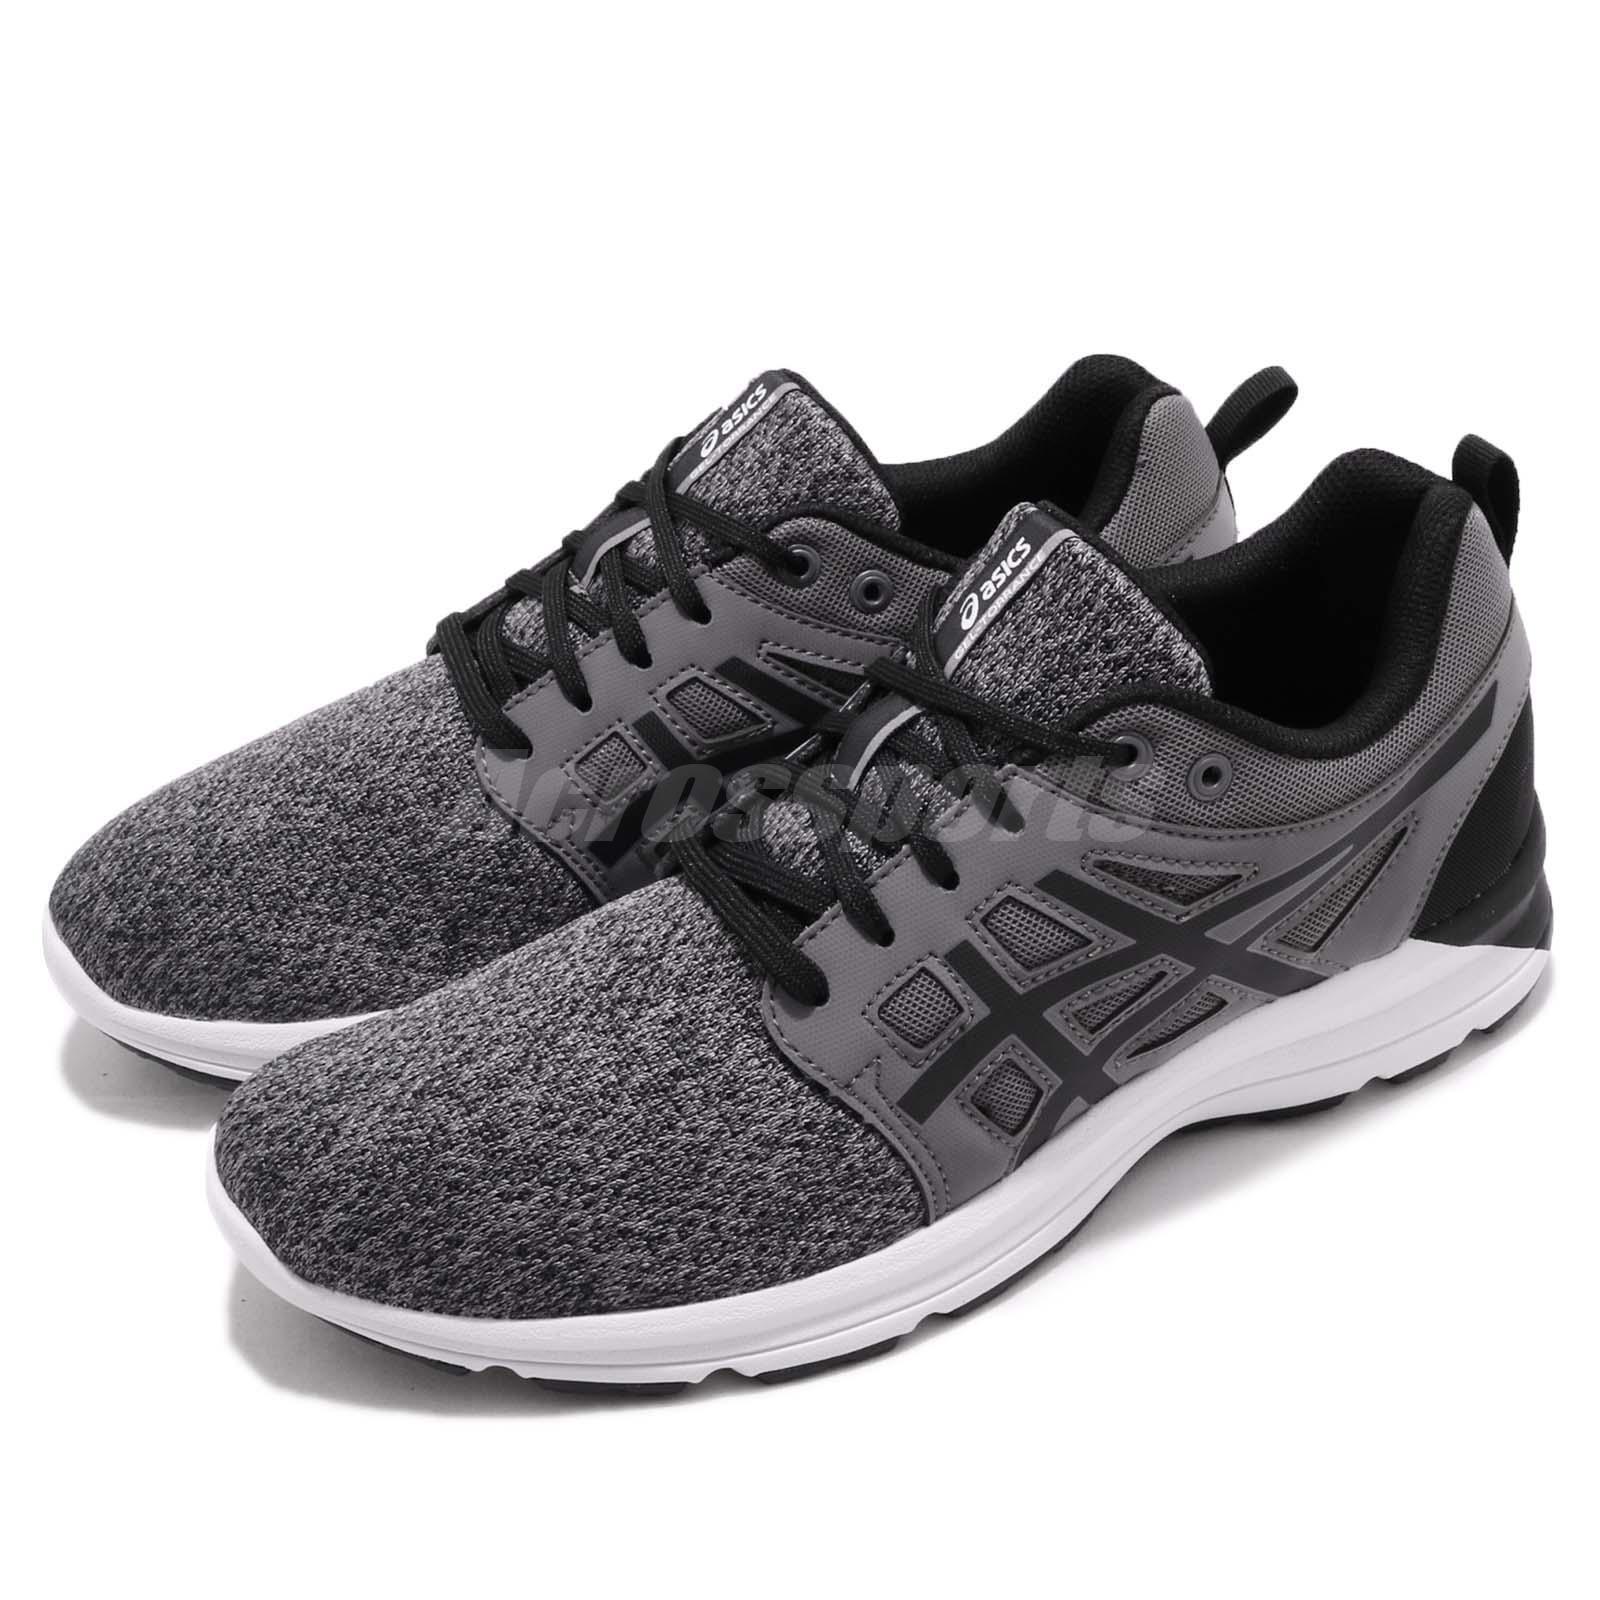 Asics Gel-Torrance Carbon negro blanco Men Running zapatos zapatillas 1021A049-020